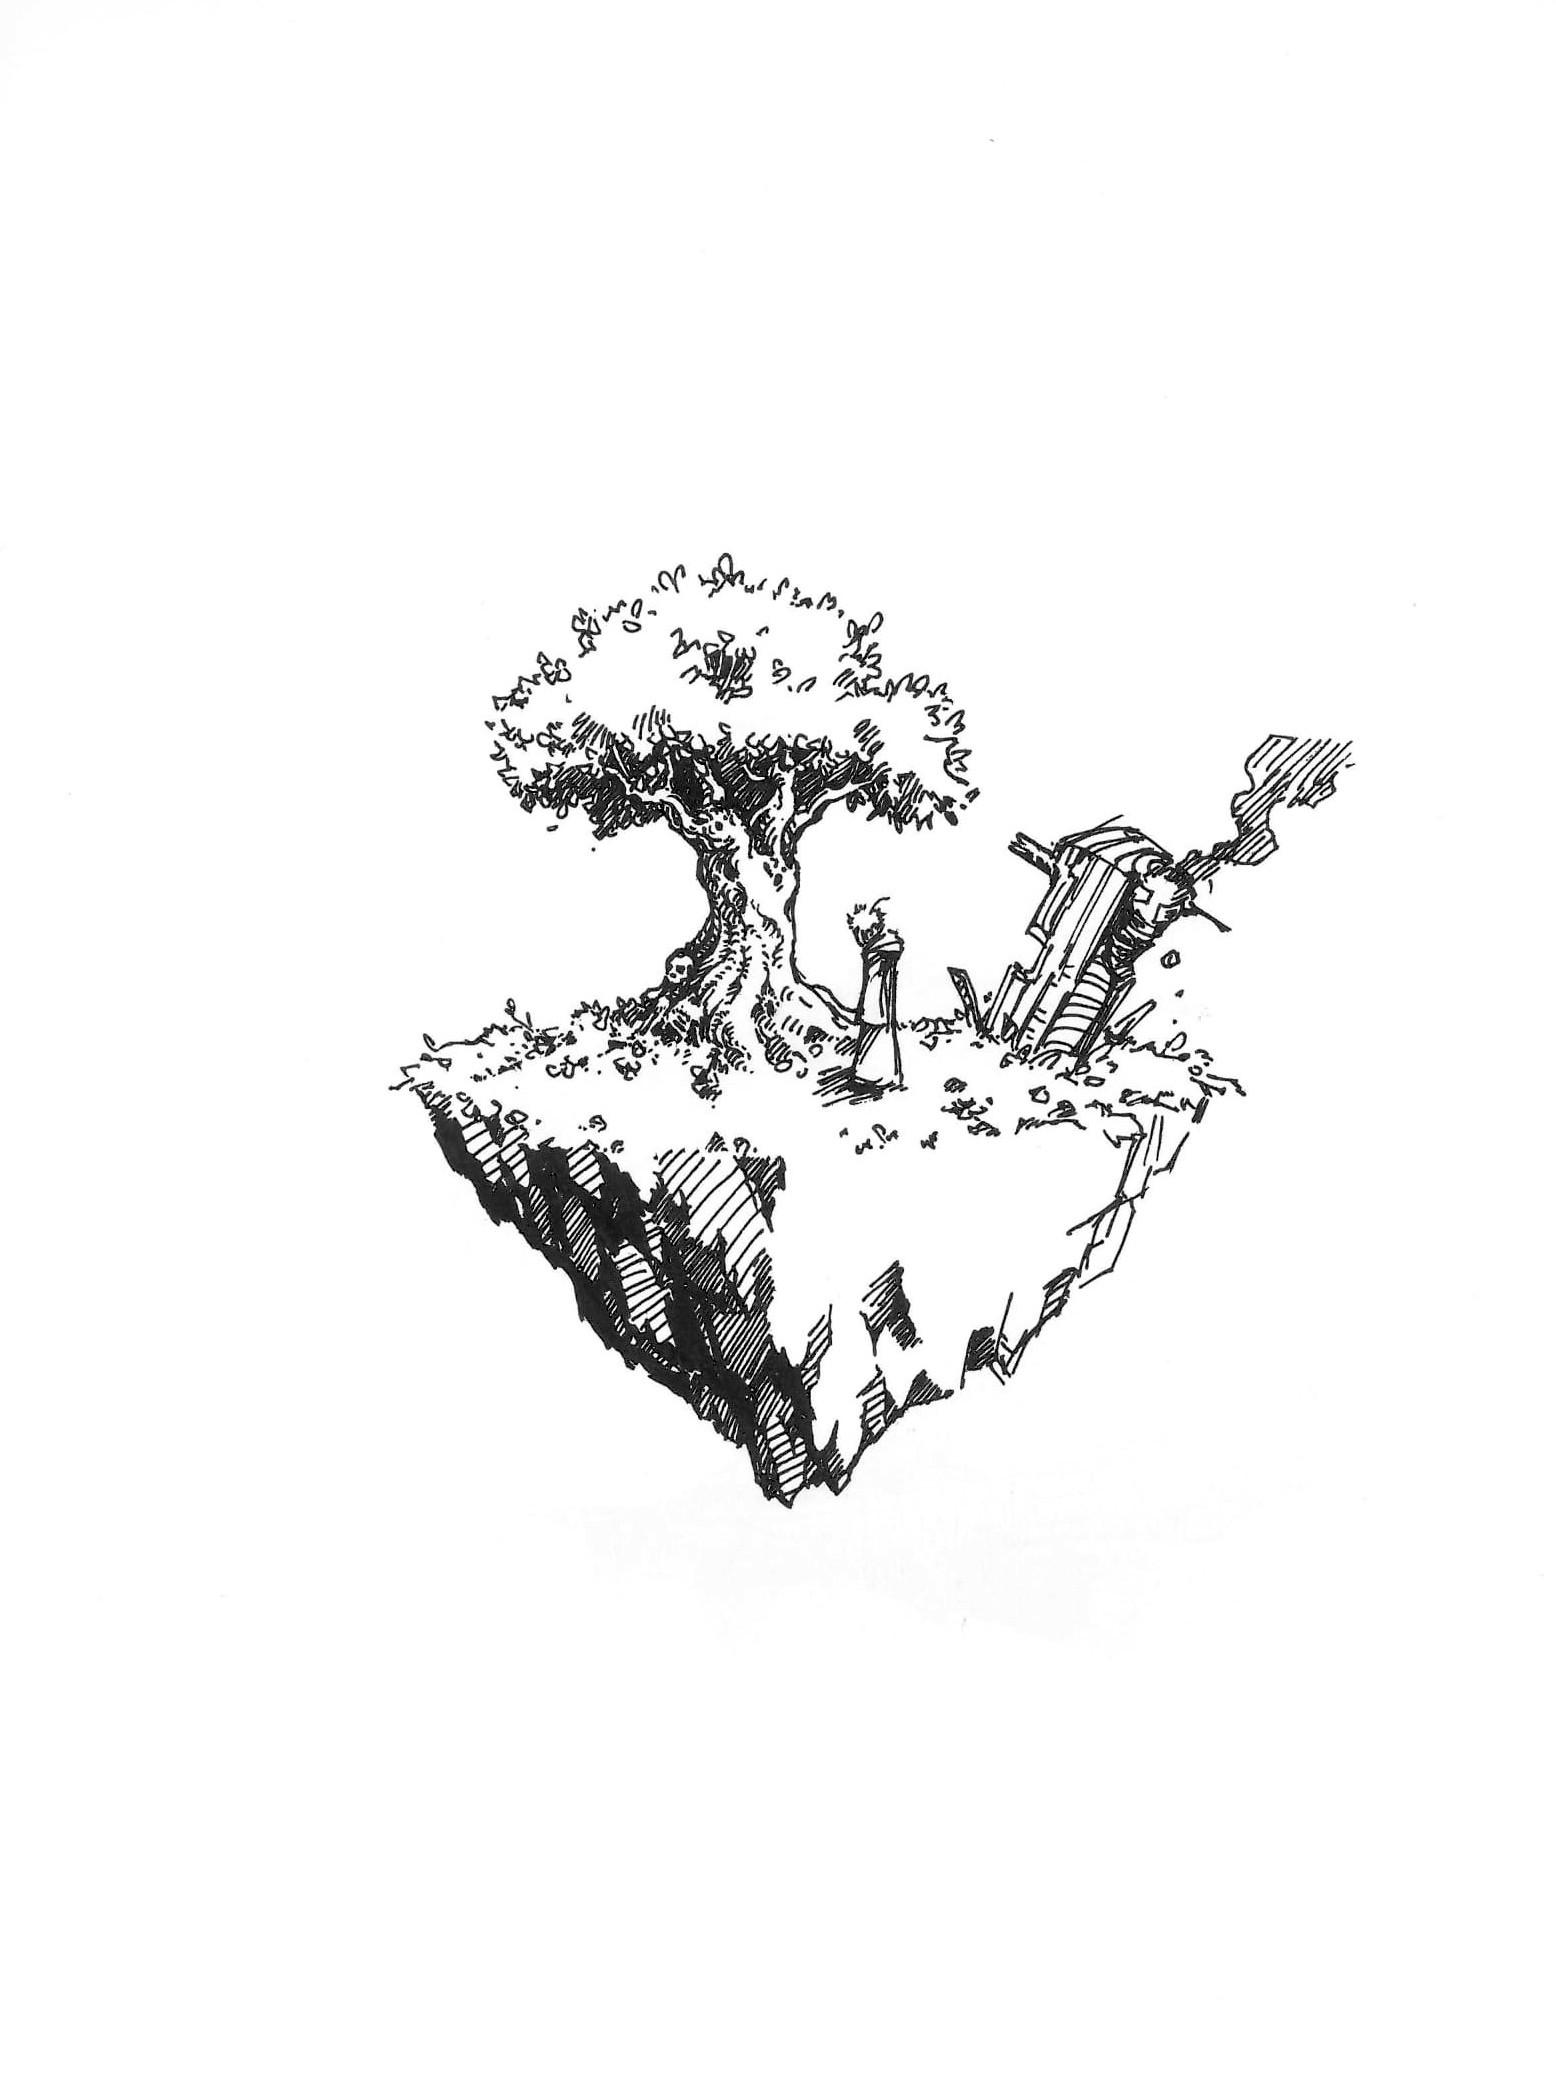 Lee Dabeen. Screwed. 2018. Pen on paper, 297 x 210 mm.